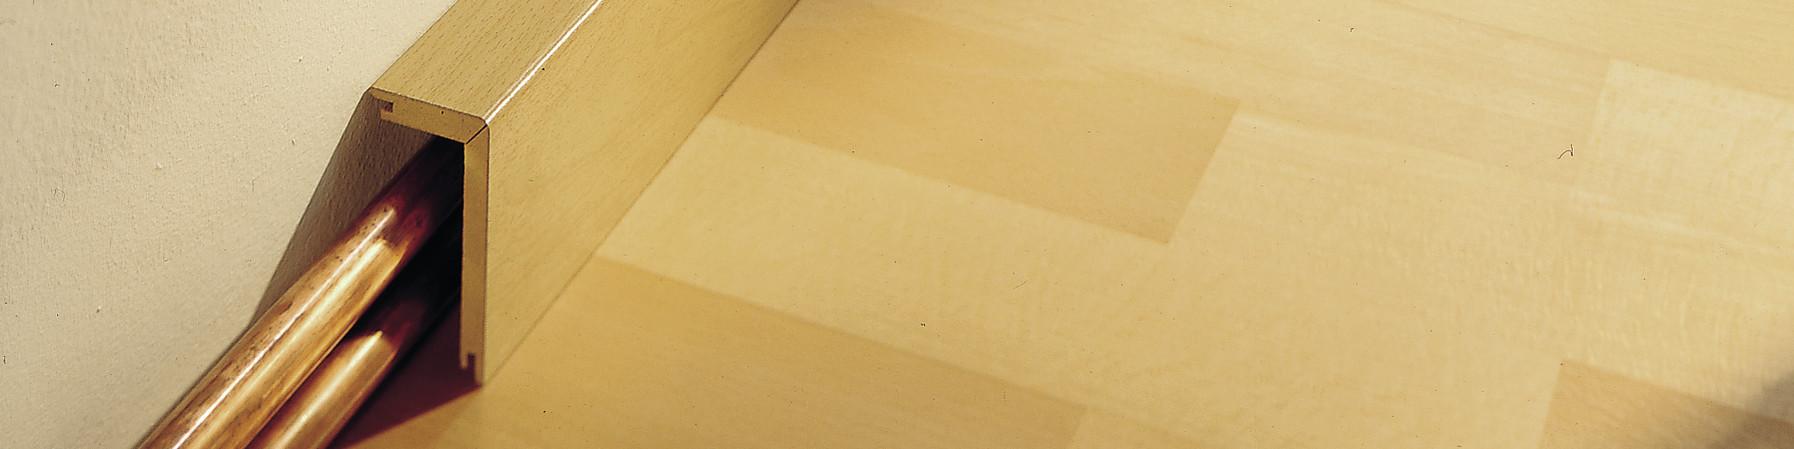 rohrabdeckleiste funktionsleisten profiles and more. Black Bedroom Furniture Sets. Home Design Ideas